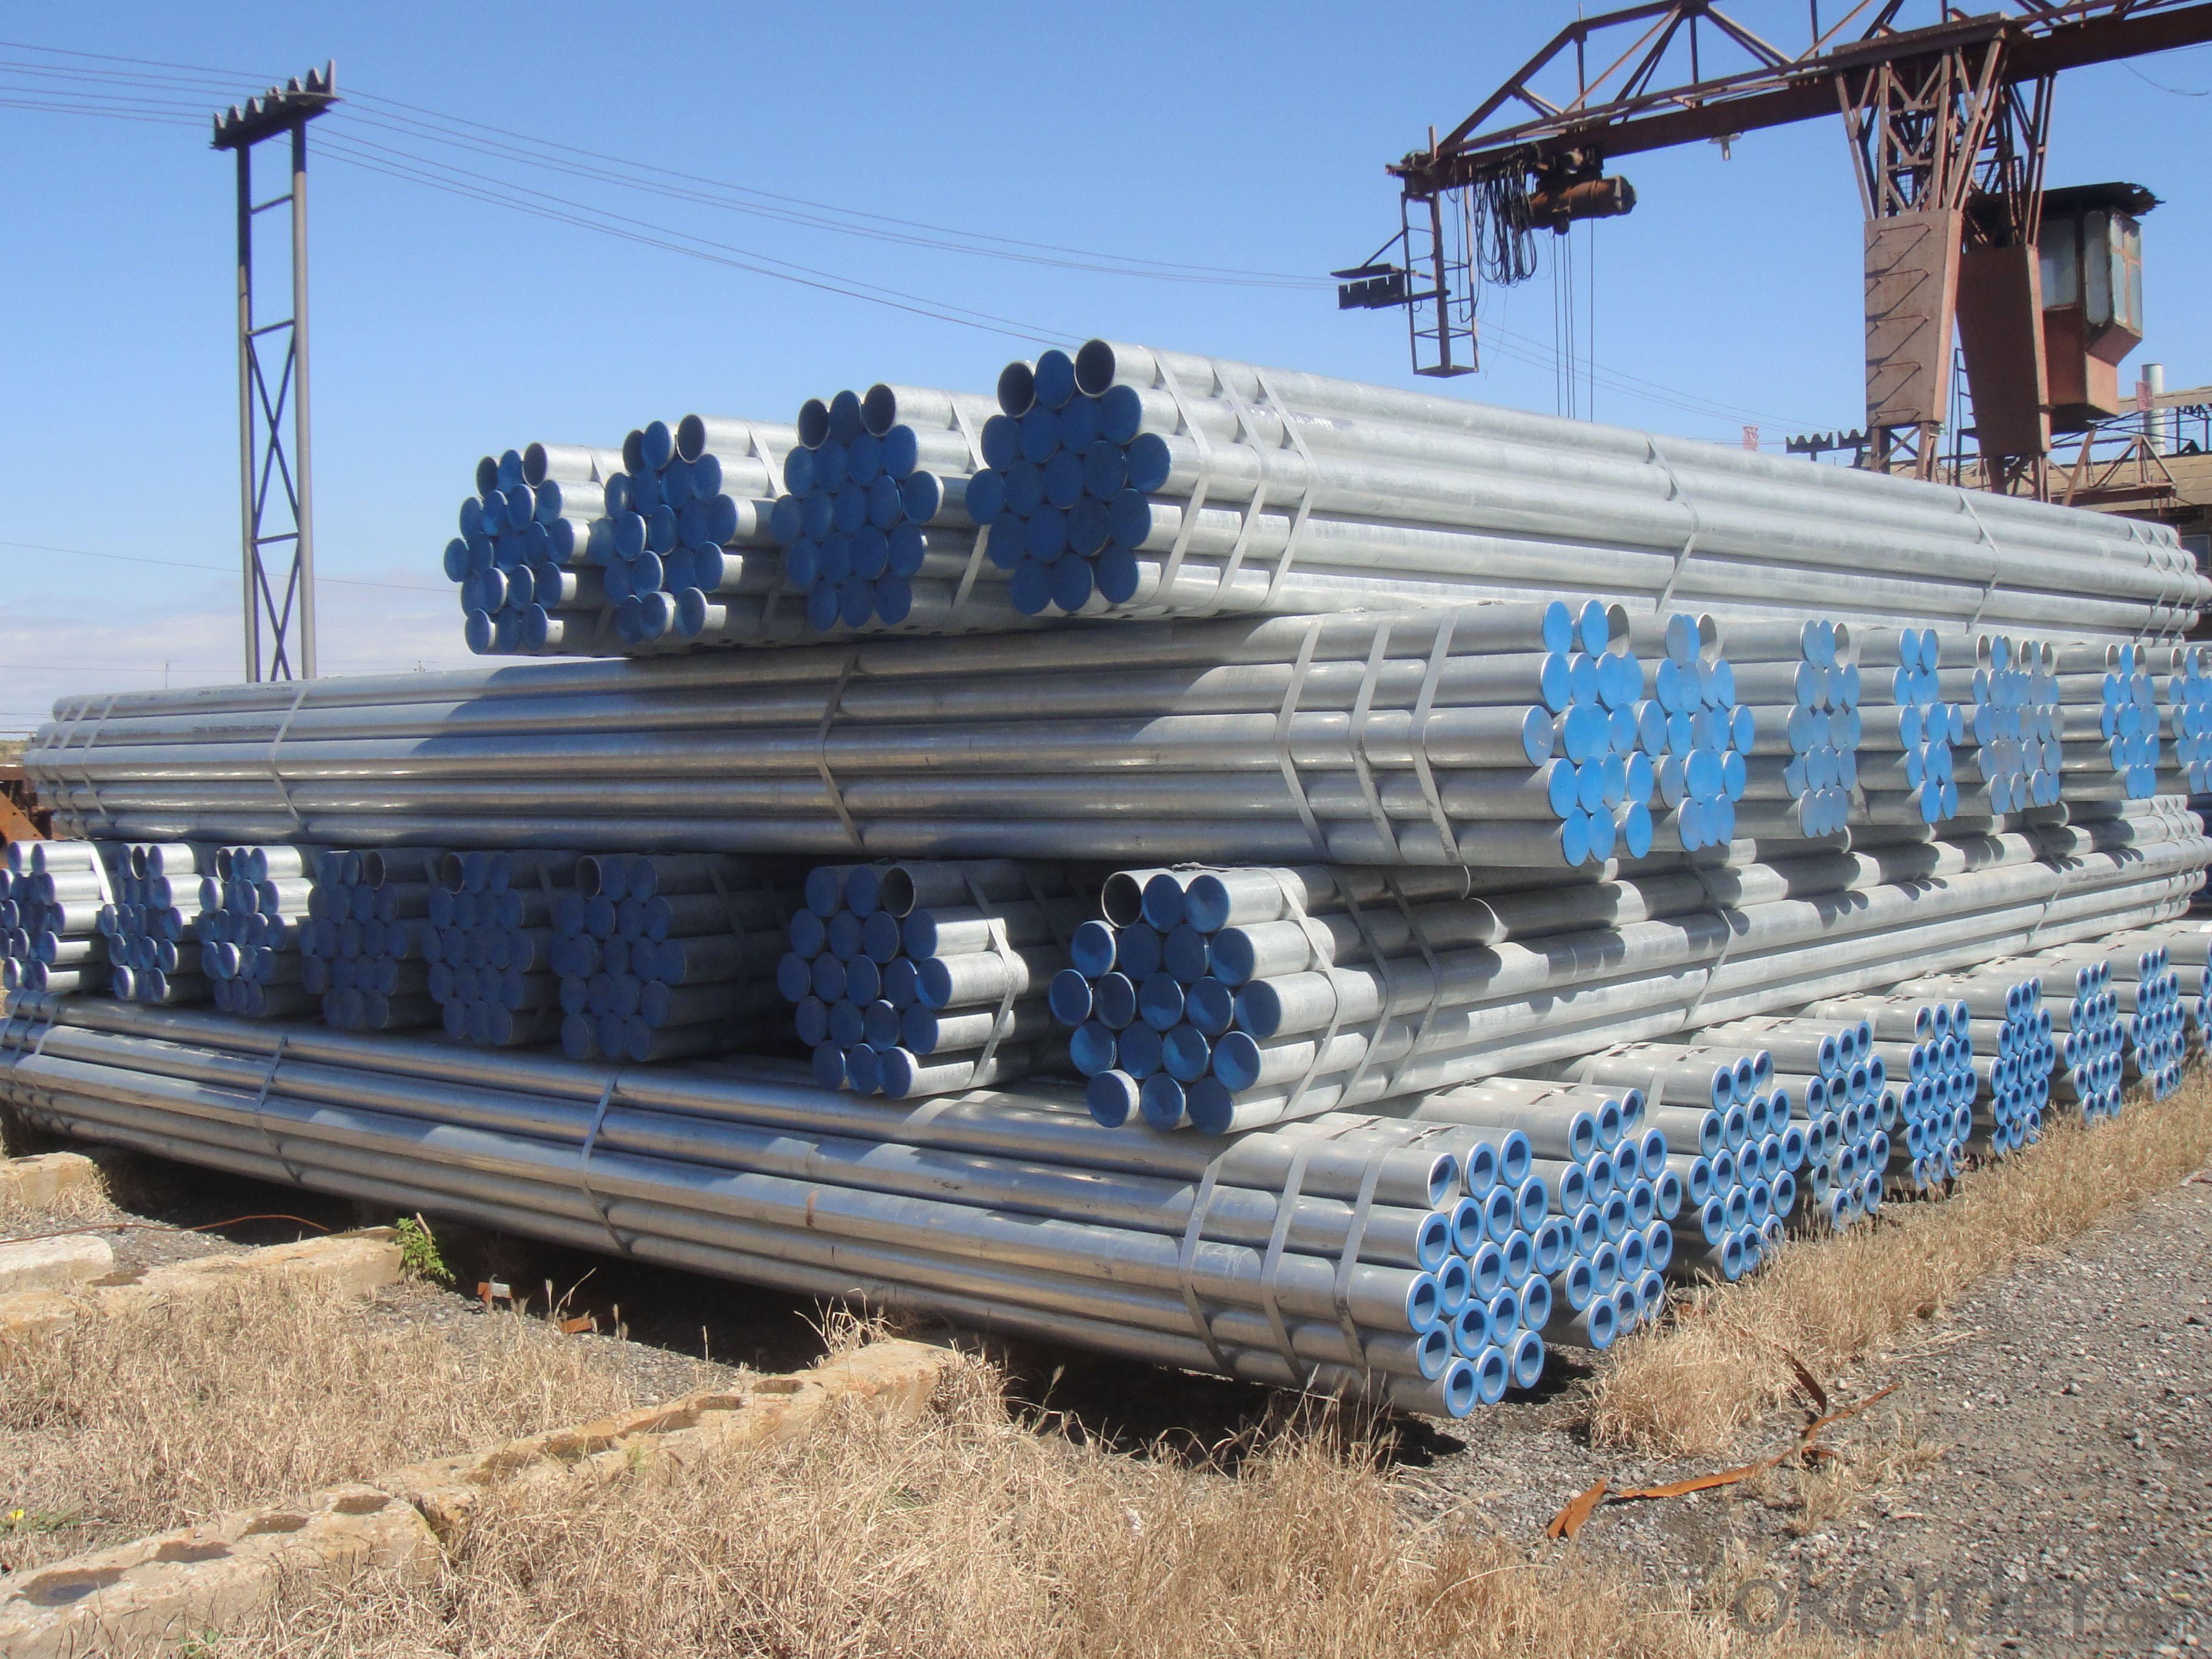 "BON STEEL GALVANIZED PIPE 1-4"" ASTM A53 BEST PRICE"